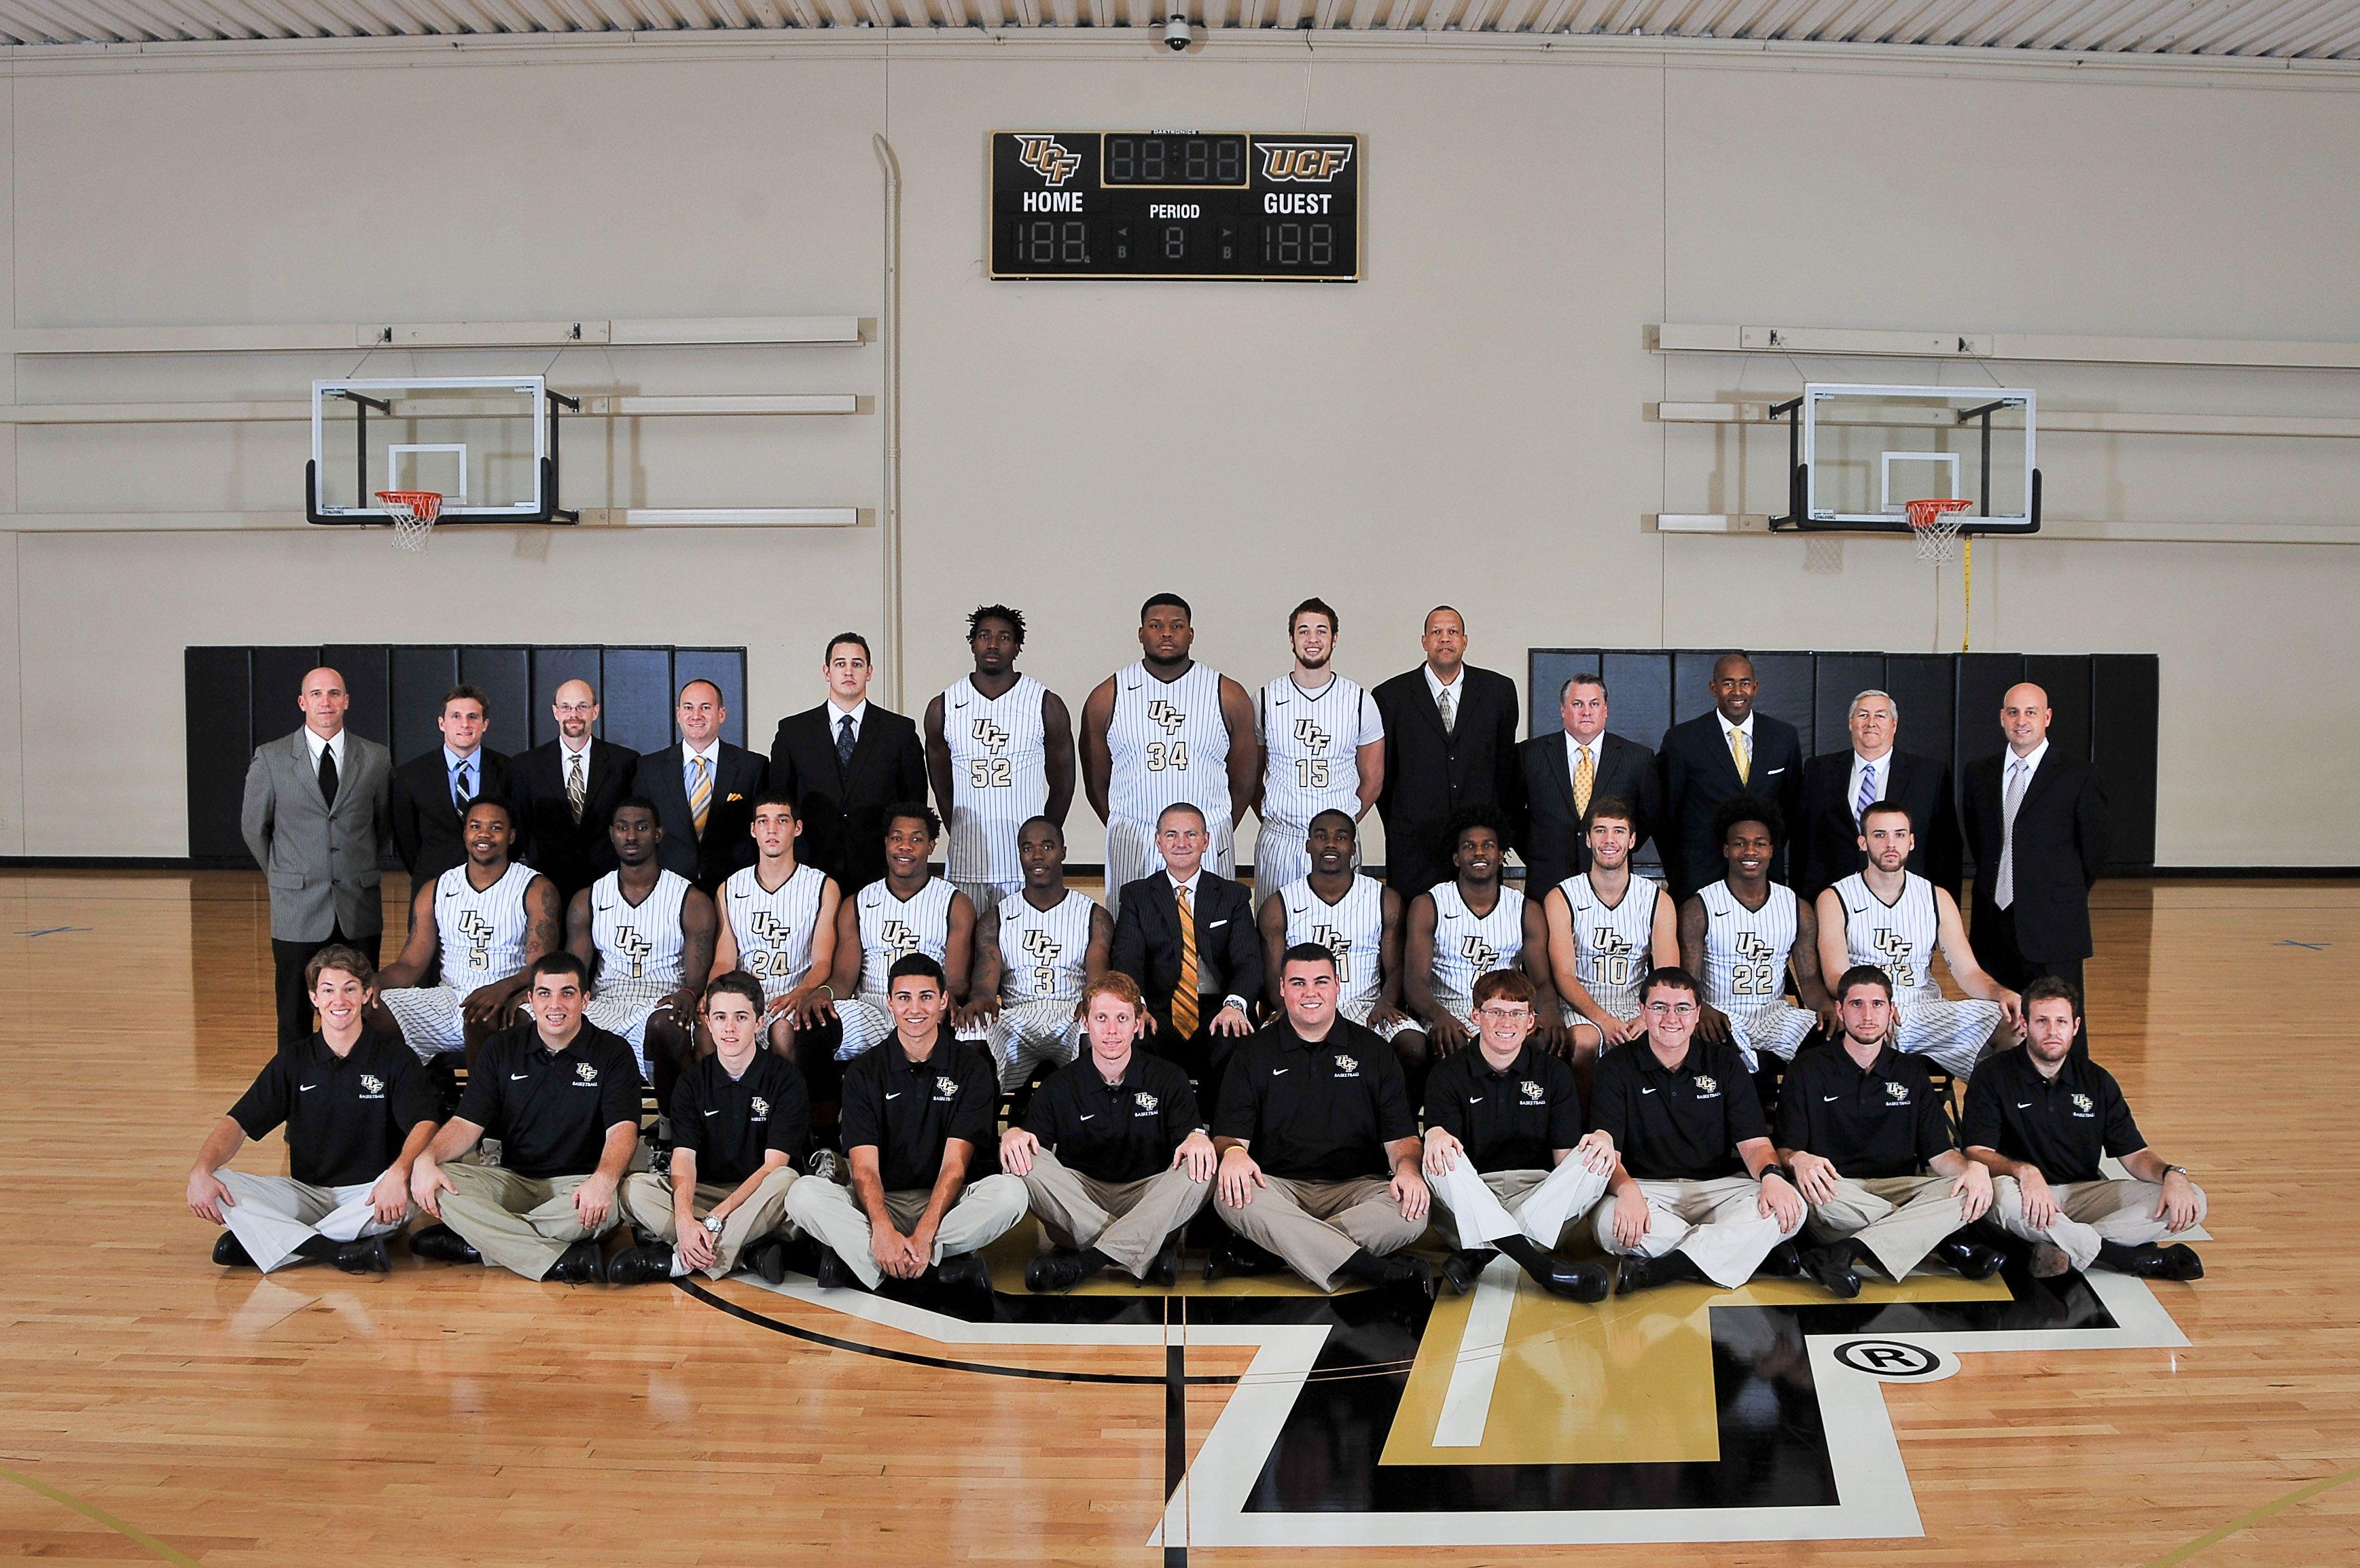 2013 UCF Men's Basketball